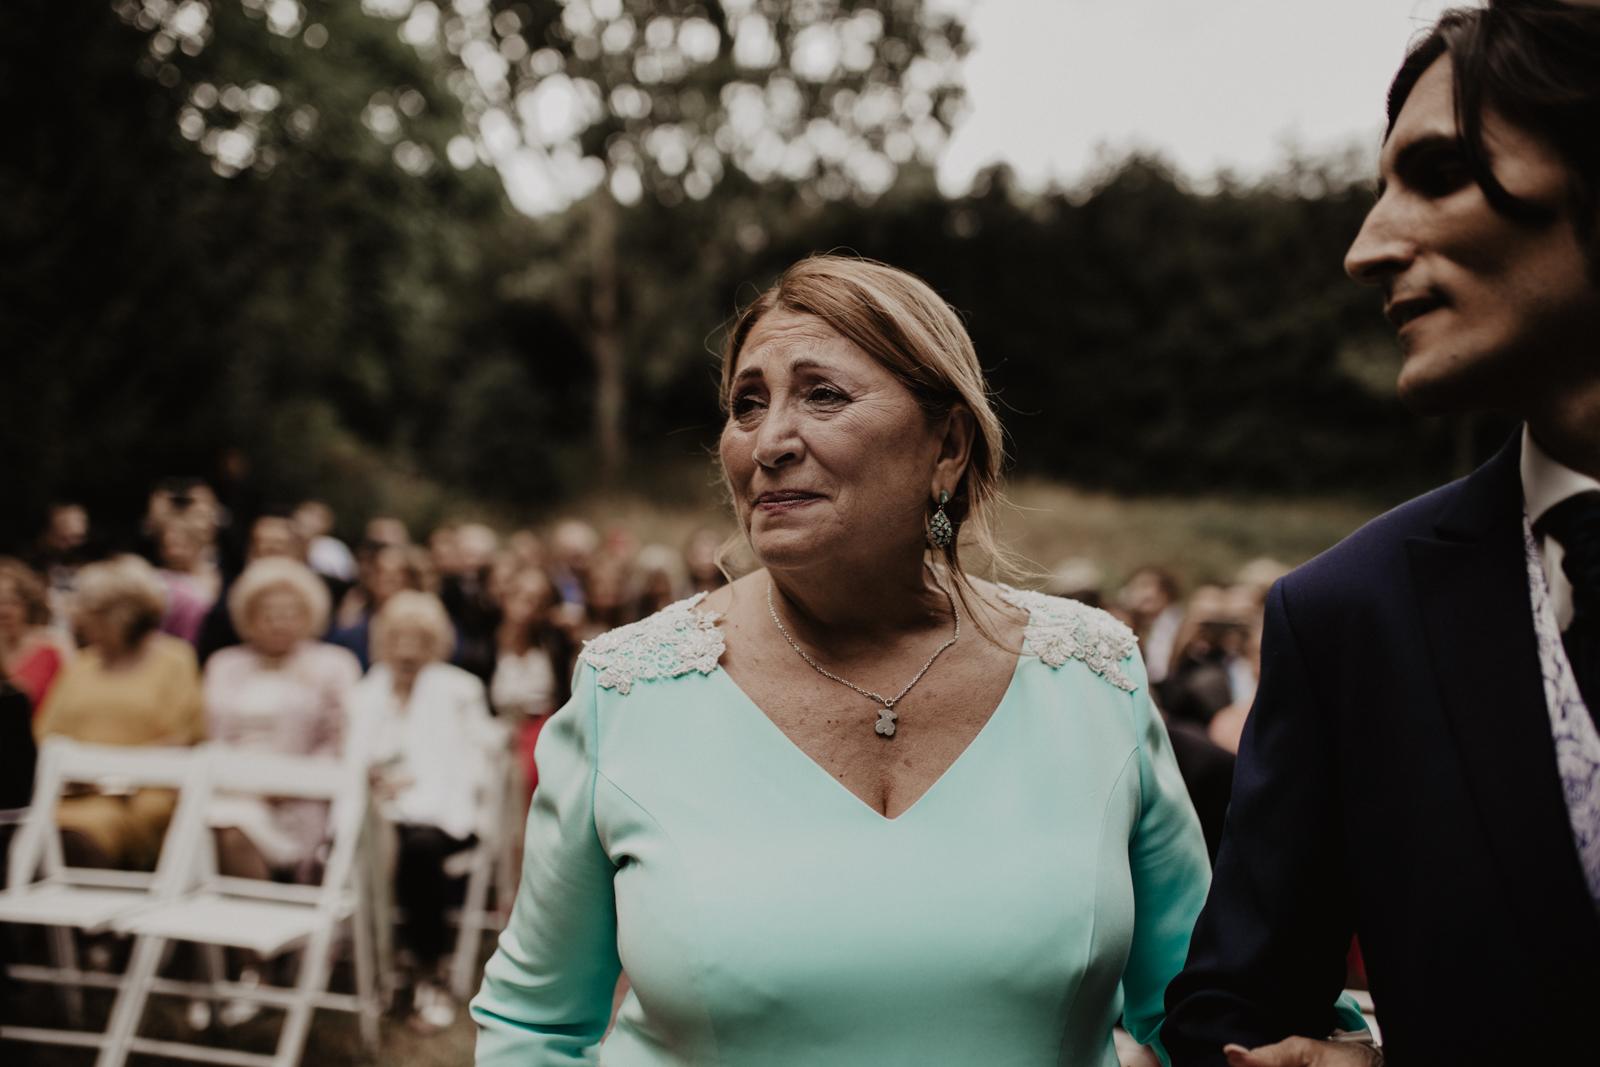 thenortherngirlphotography_photography_thenortherngirl_rebeccascabros_wedding_weddingphotography_weddingphotographer_barcelona_bodaenbarcelona_bodaenmaselmarti_bodarogeryvane-342.jpg